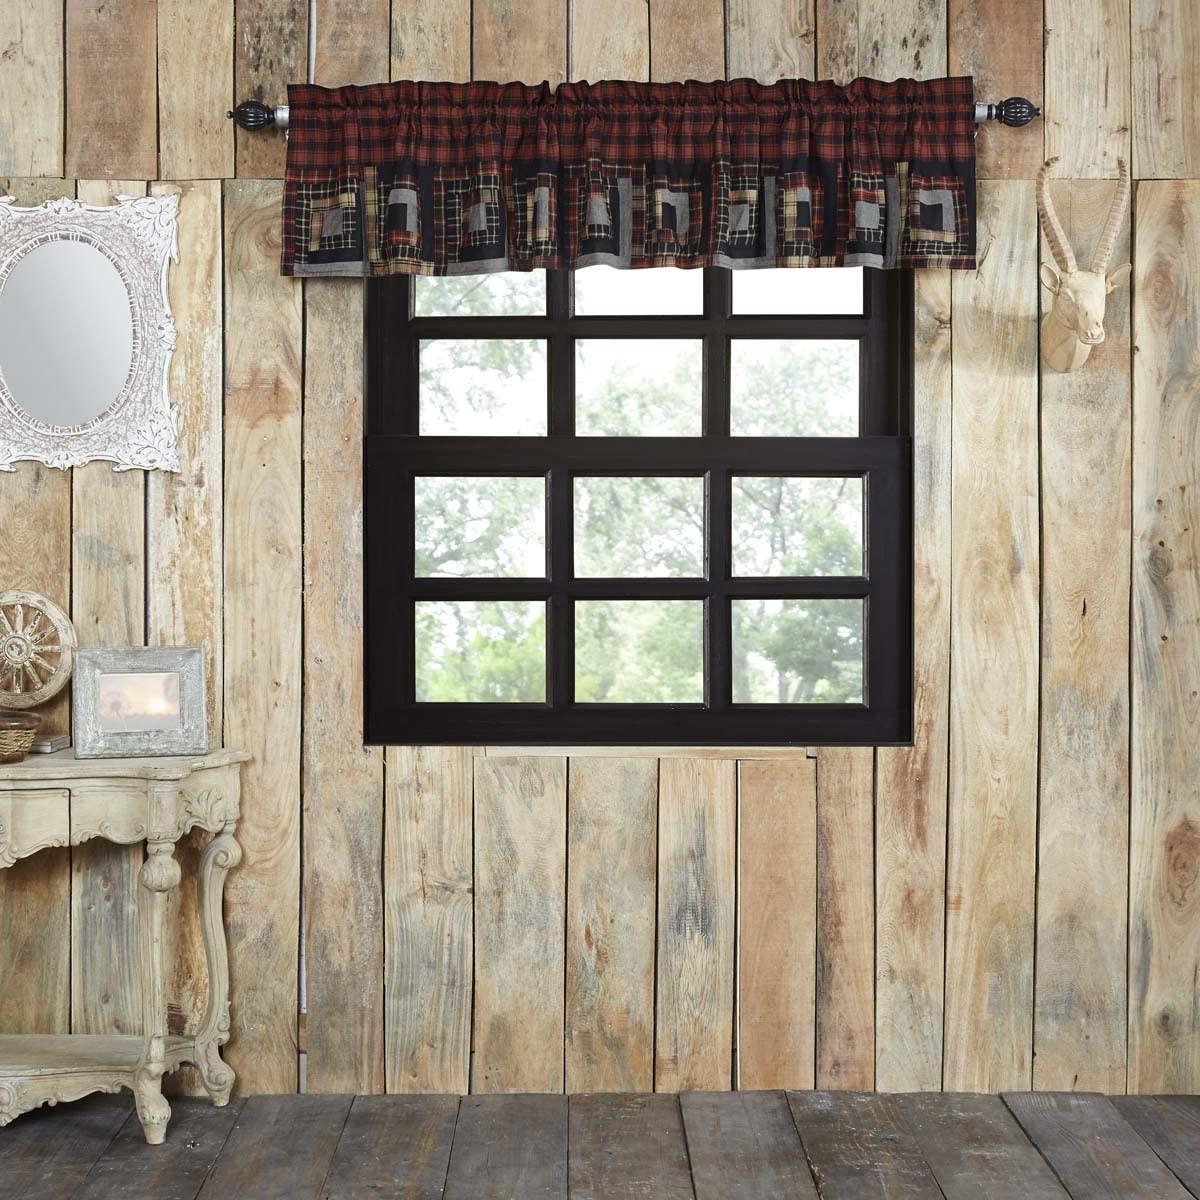 VHC Brands Rustic & Lodge Kitchen Window Cumberland Red Patchwork Curtain, Valance 16x90